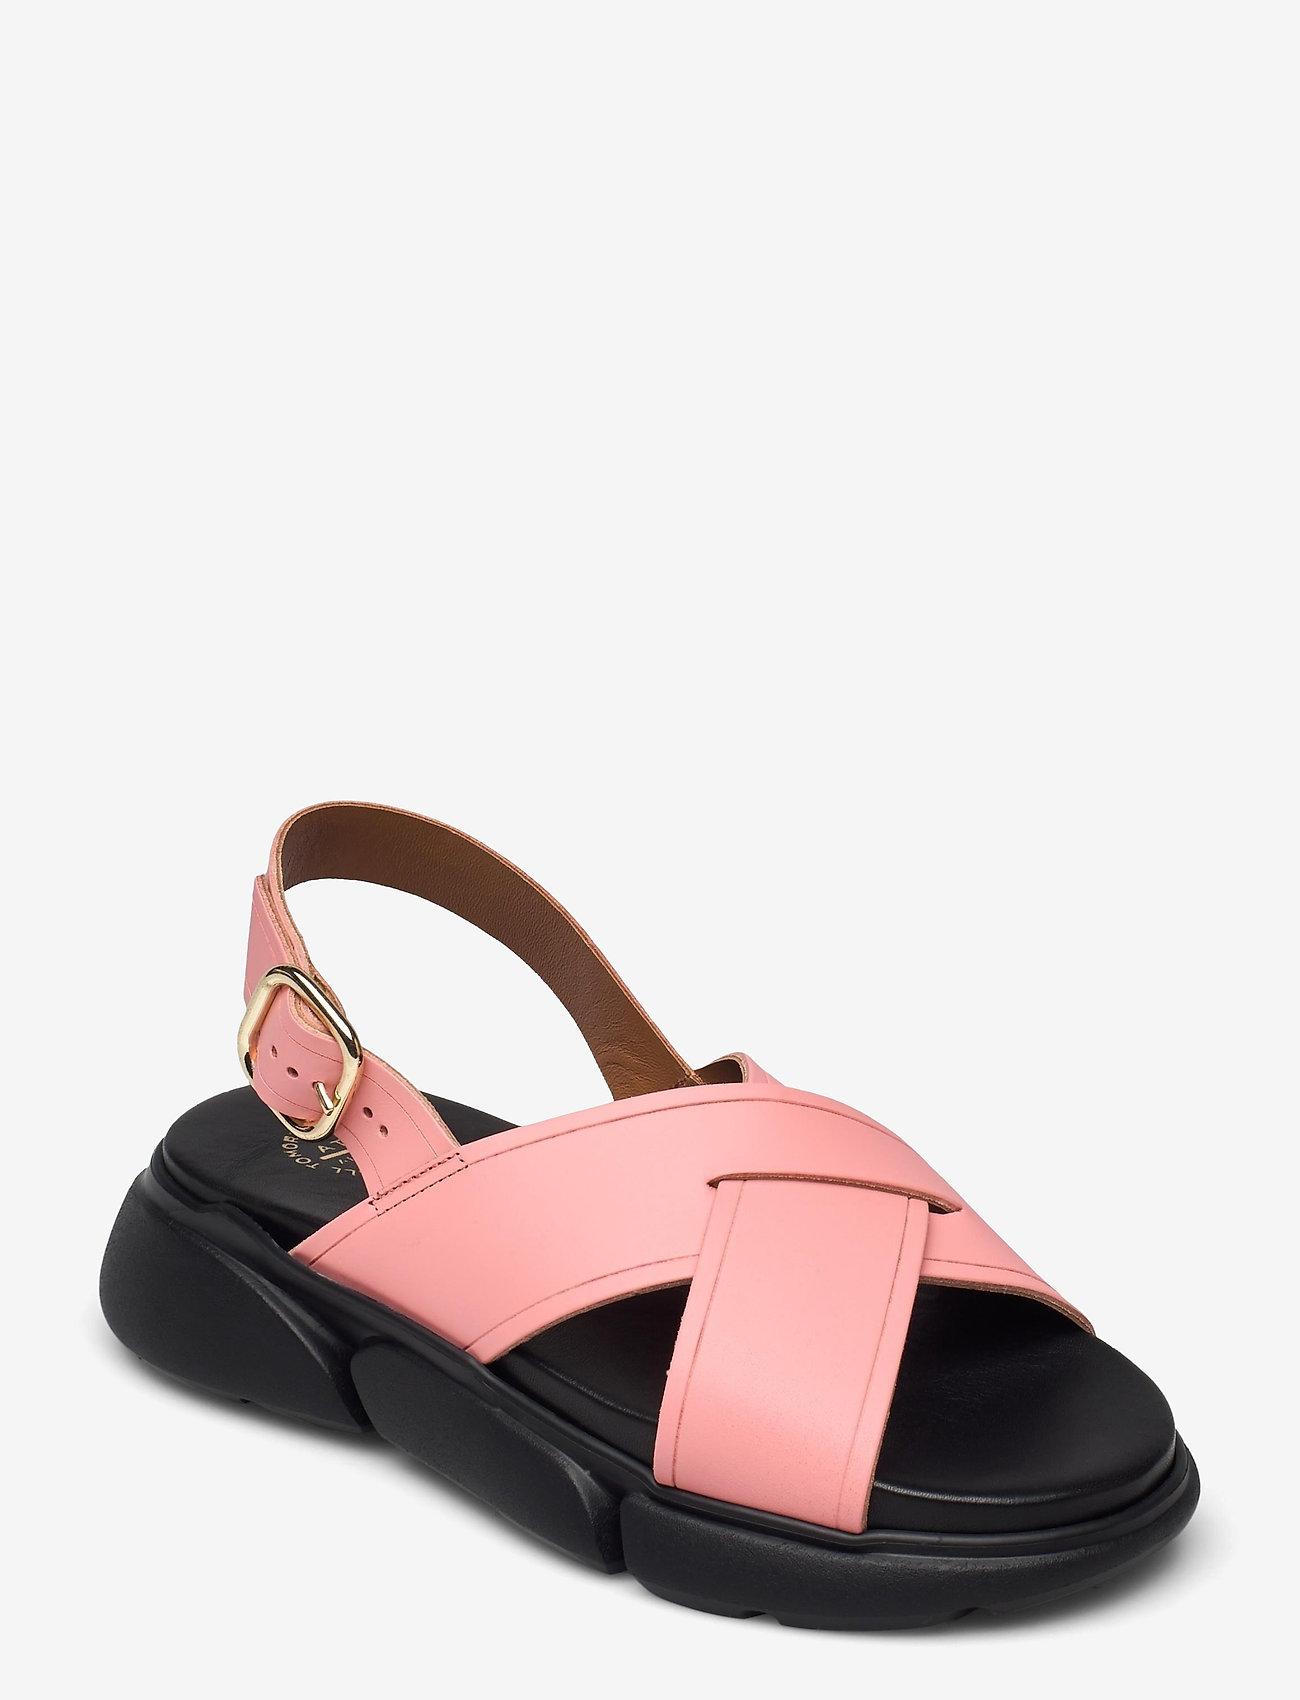 ATP Atelier - Barisci Candy Pink Vacchetta - platta sandaler - candy pink - 0